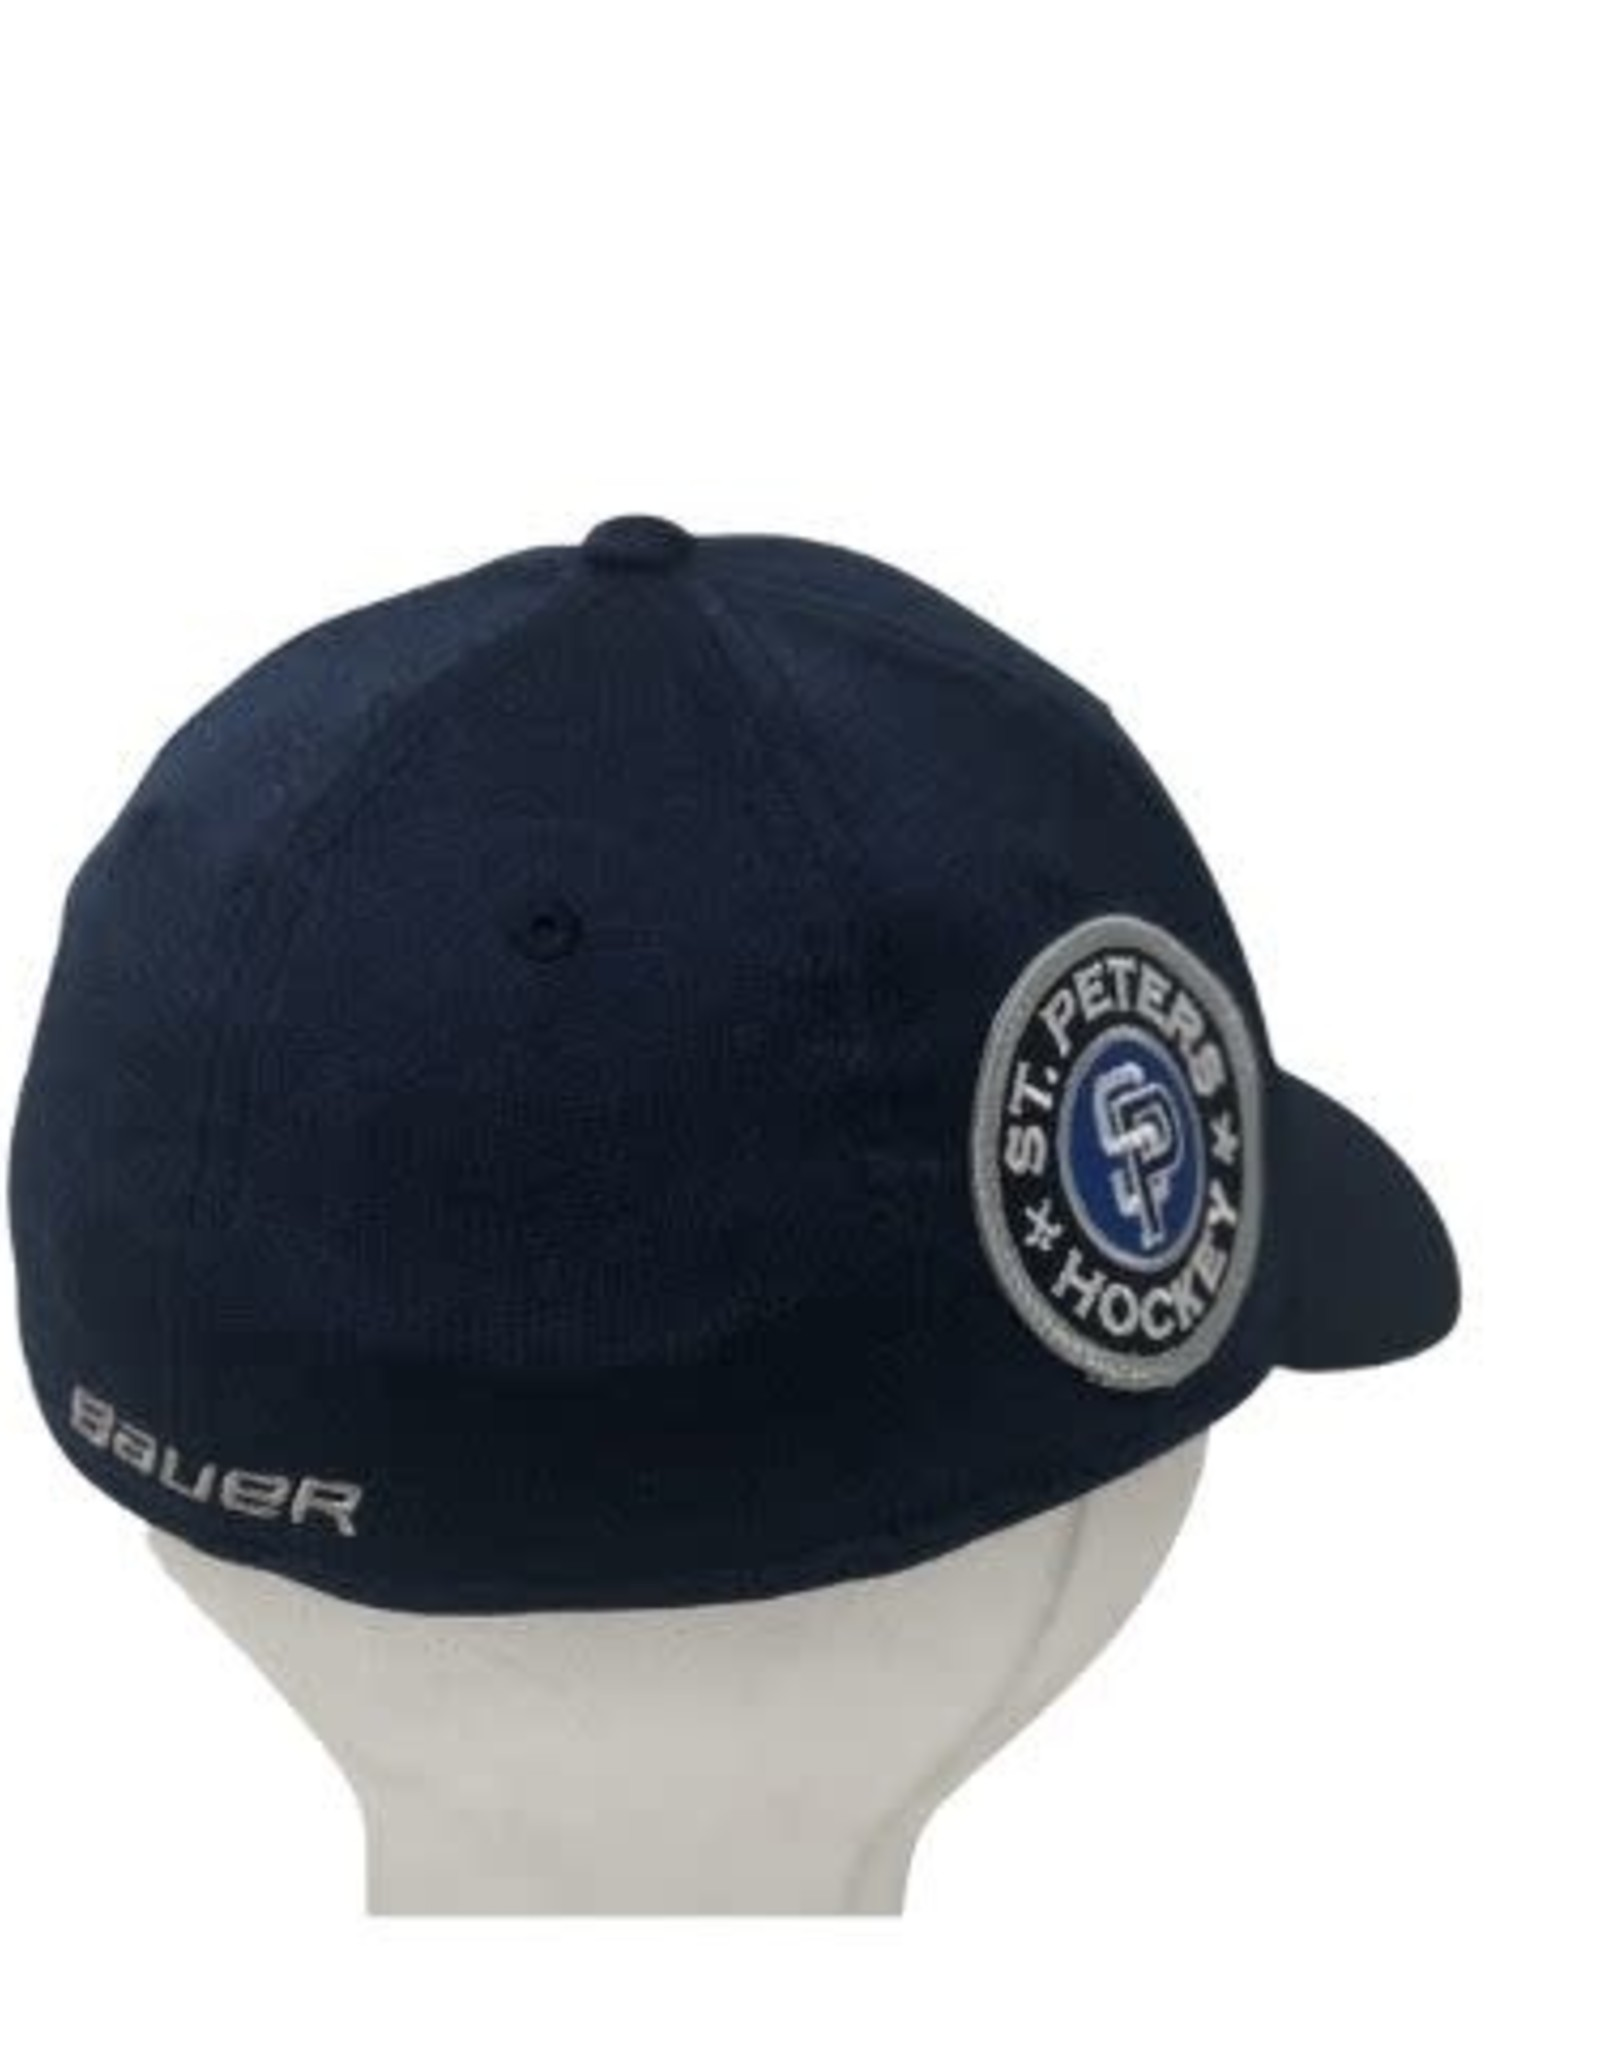 TGP Services STP Bauer 3930 Hat (LG/XL) Navy